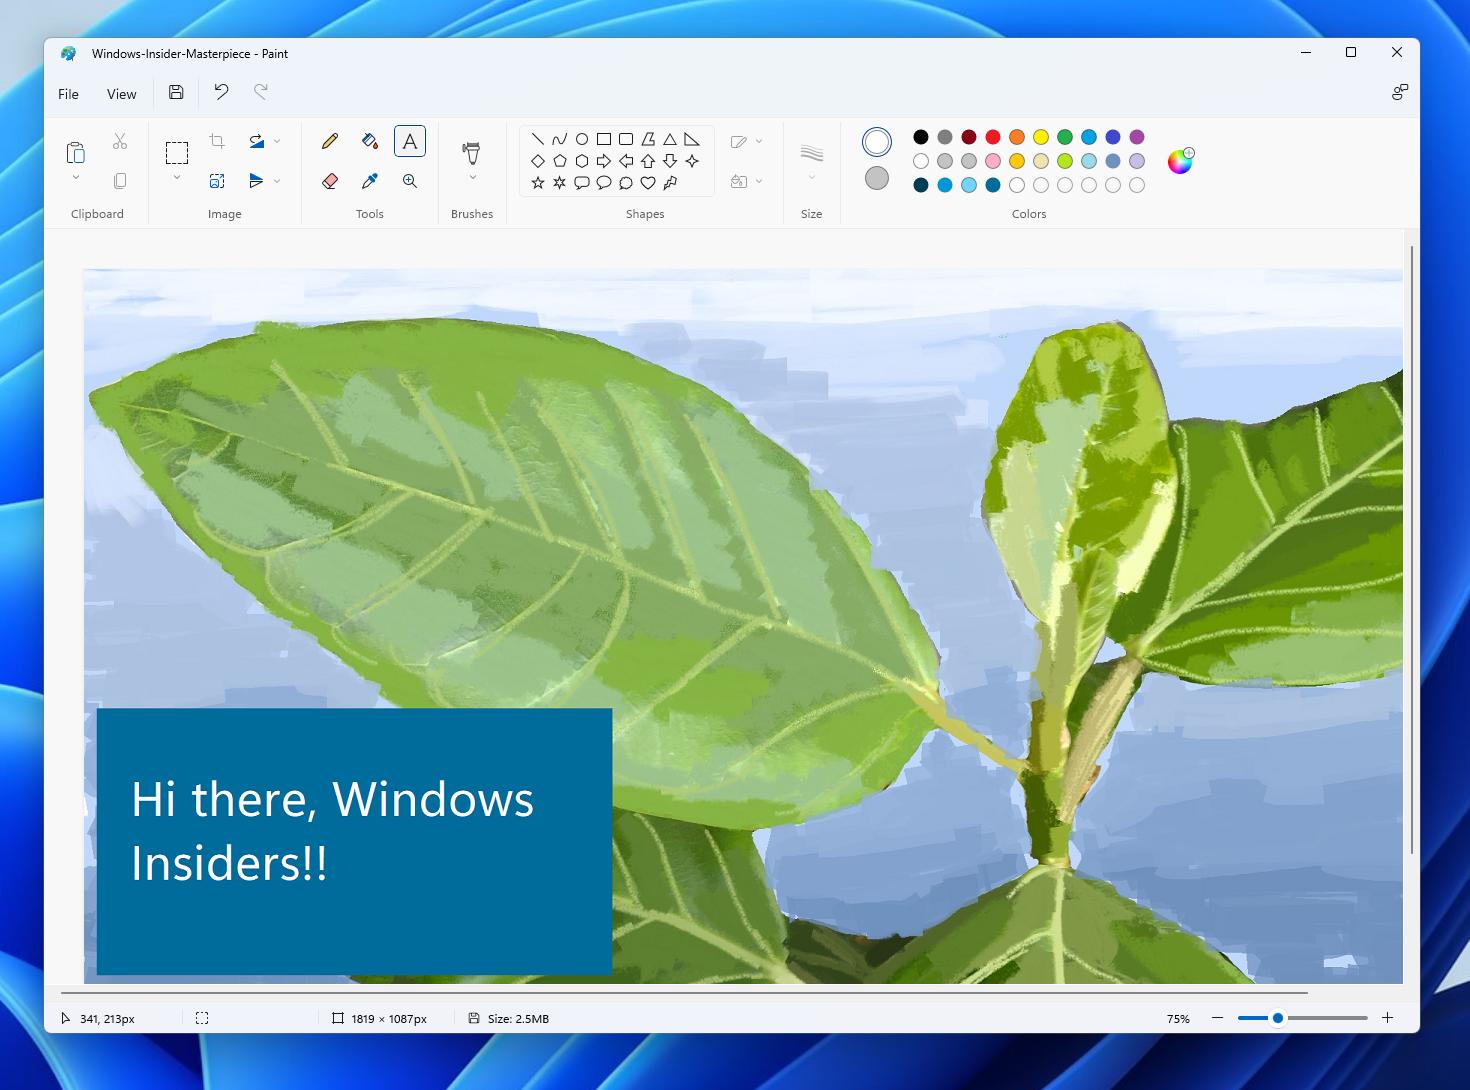 Windows 11 Paint app text